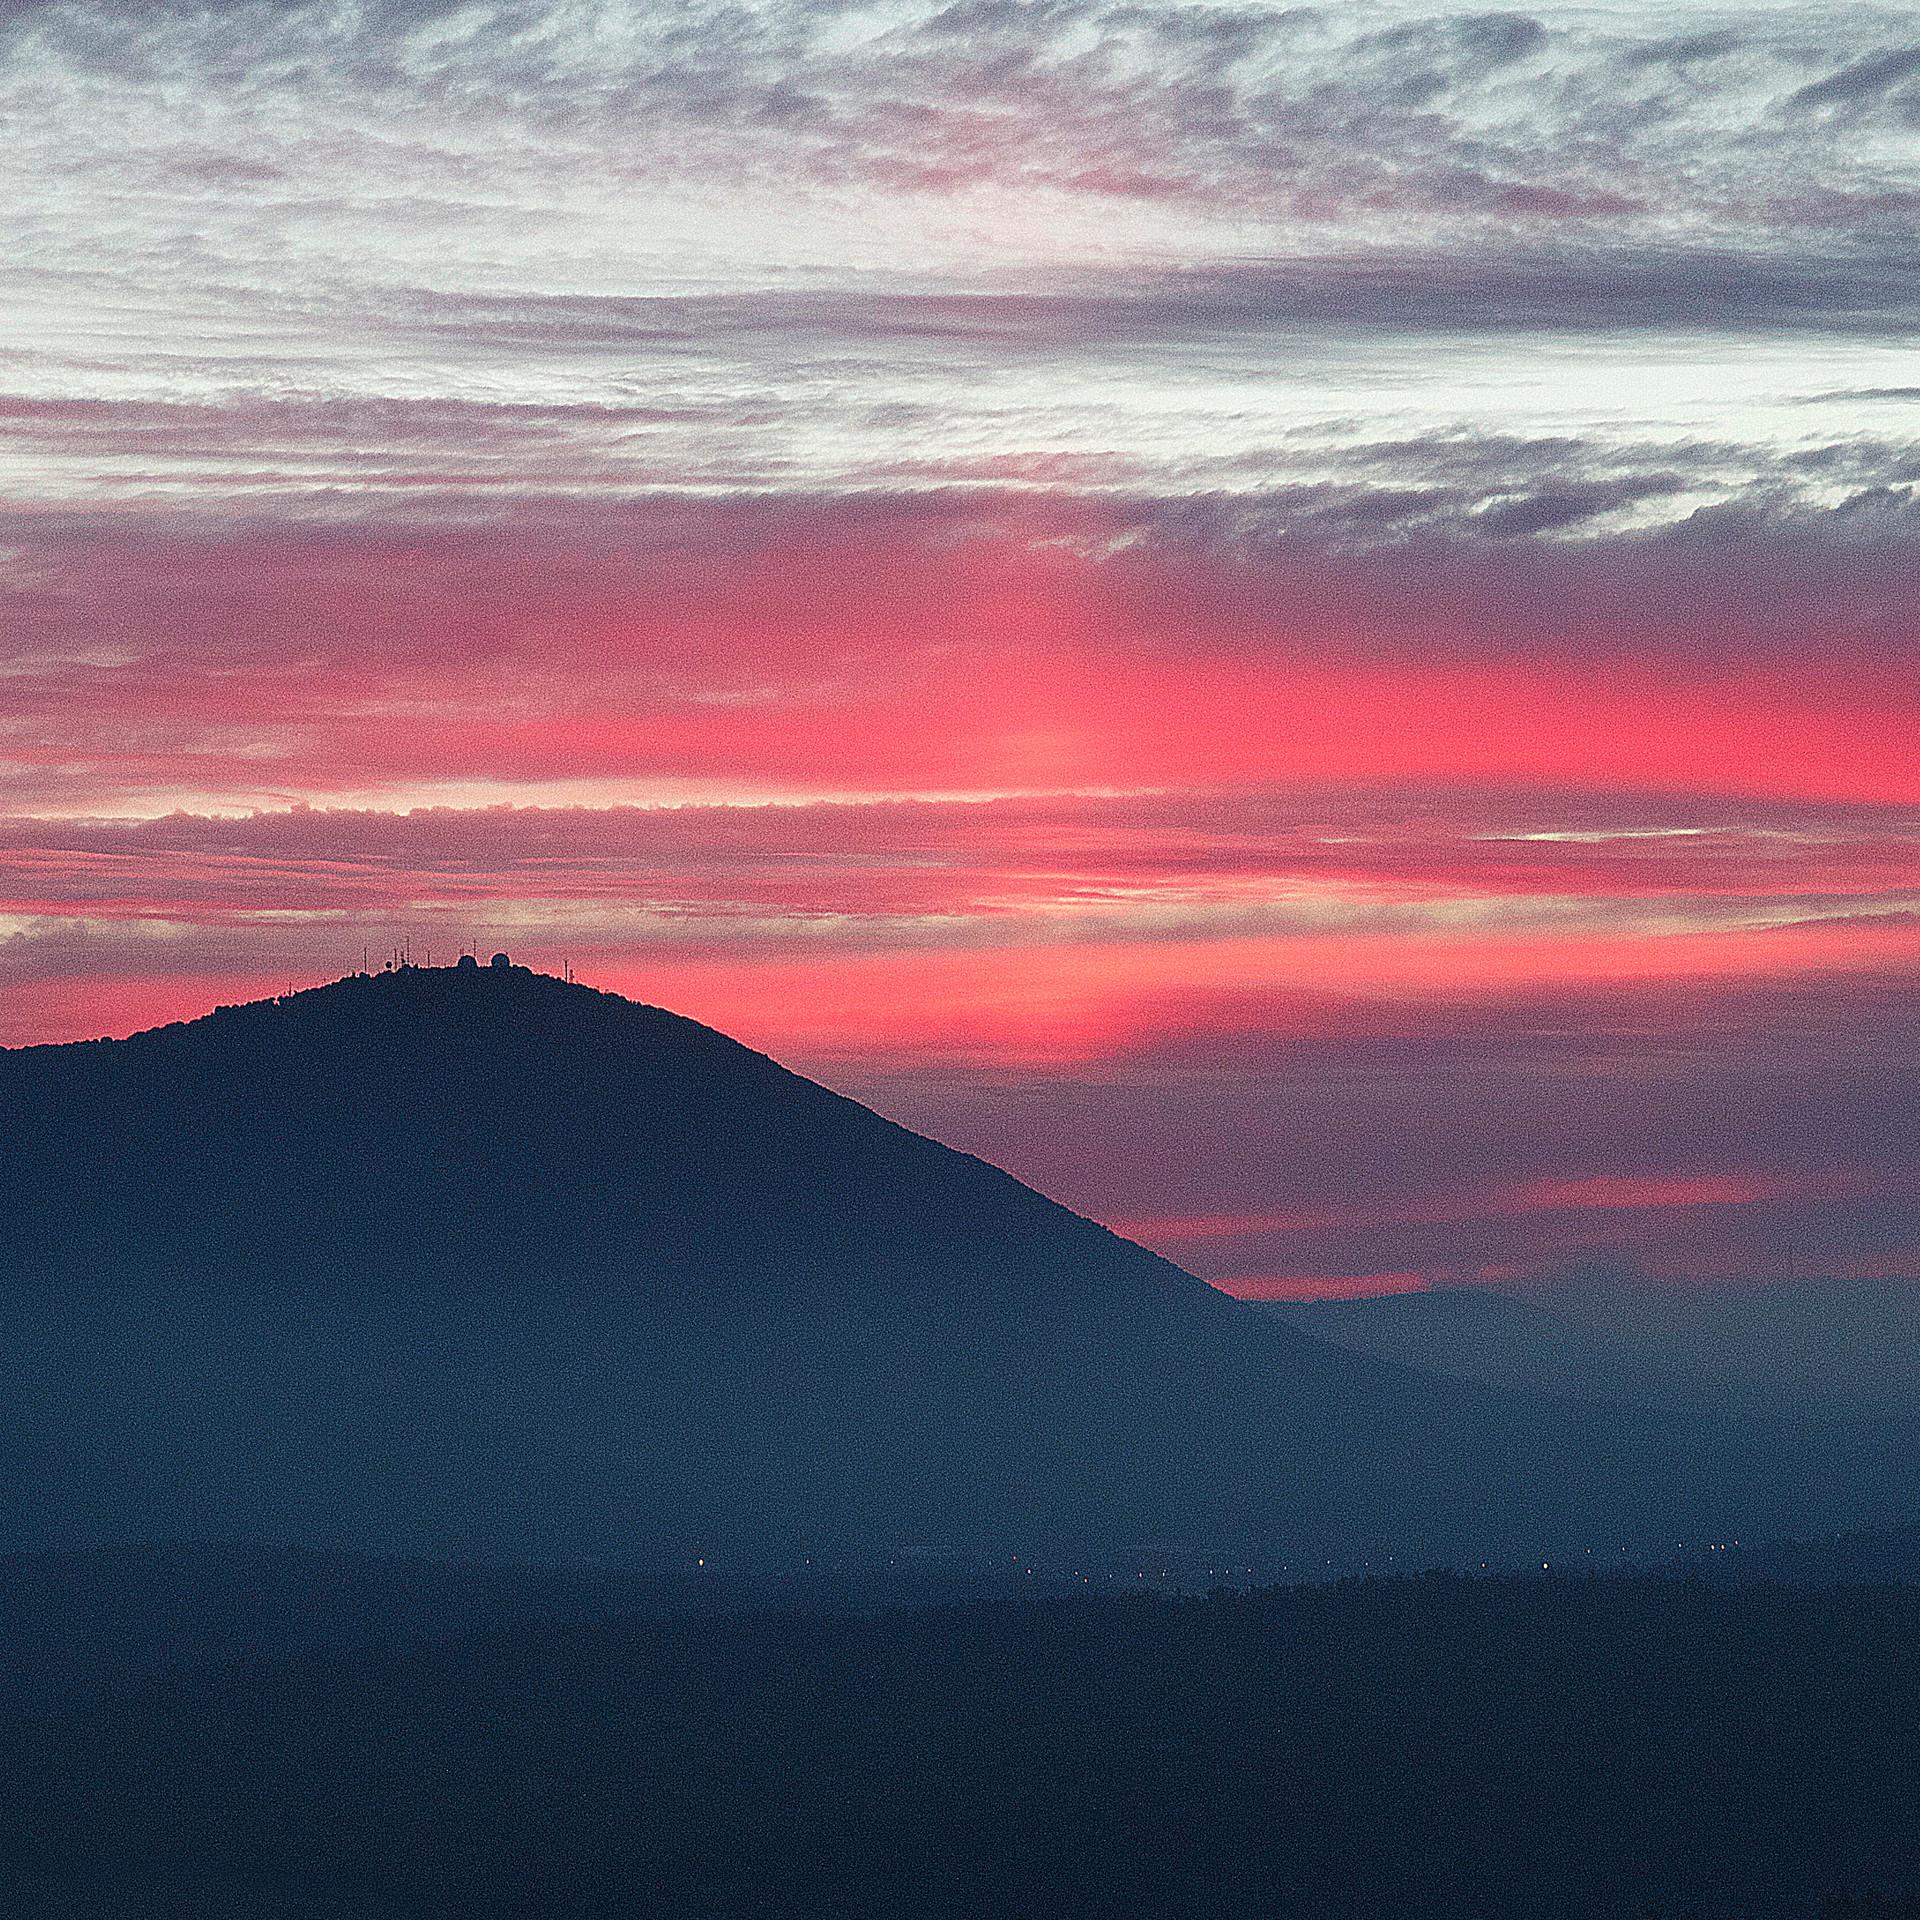 Tzfat Photo Contest Sunset as Art.jpg